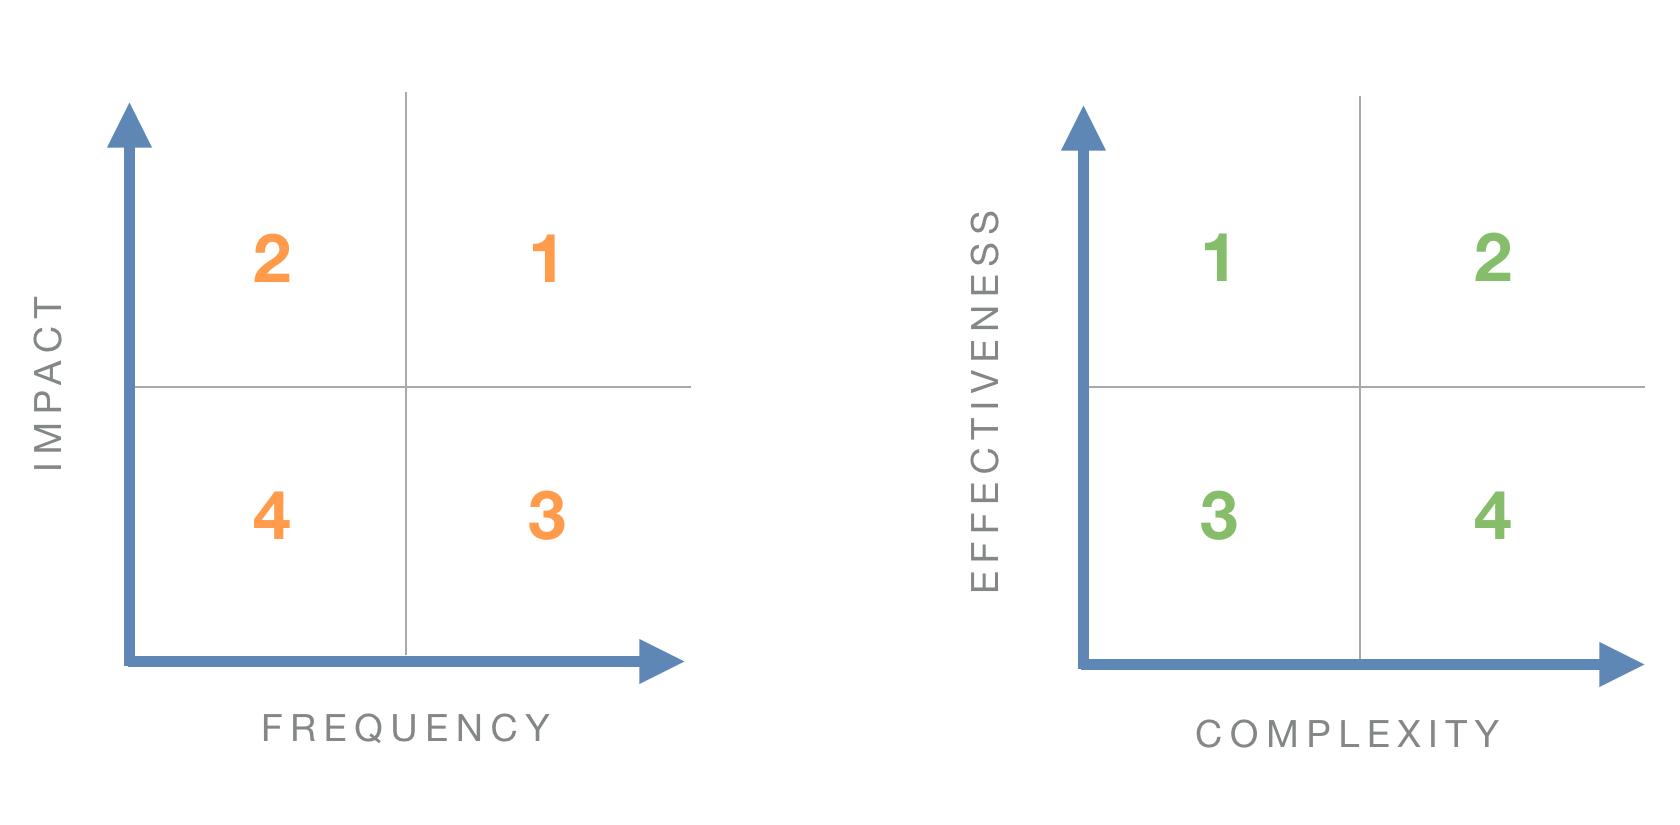 How to analyze usability test results